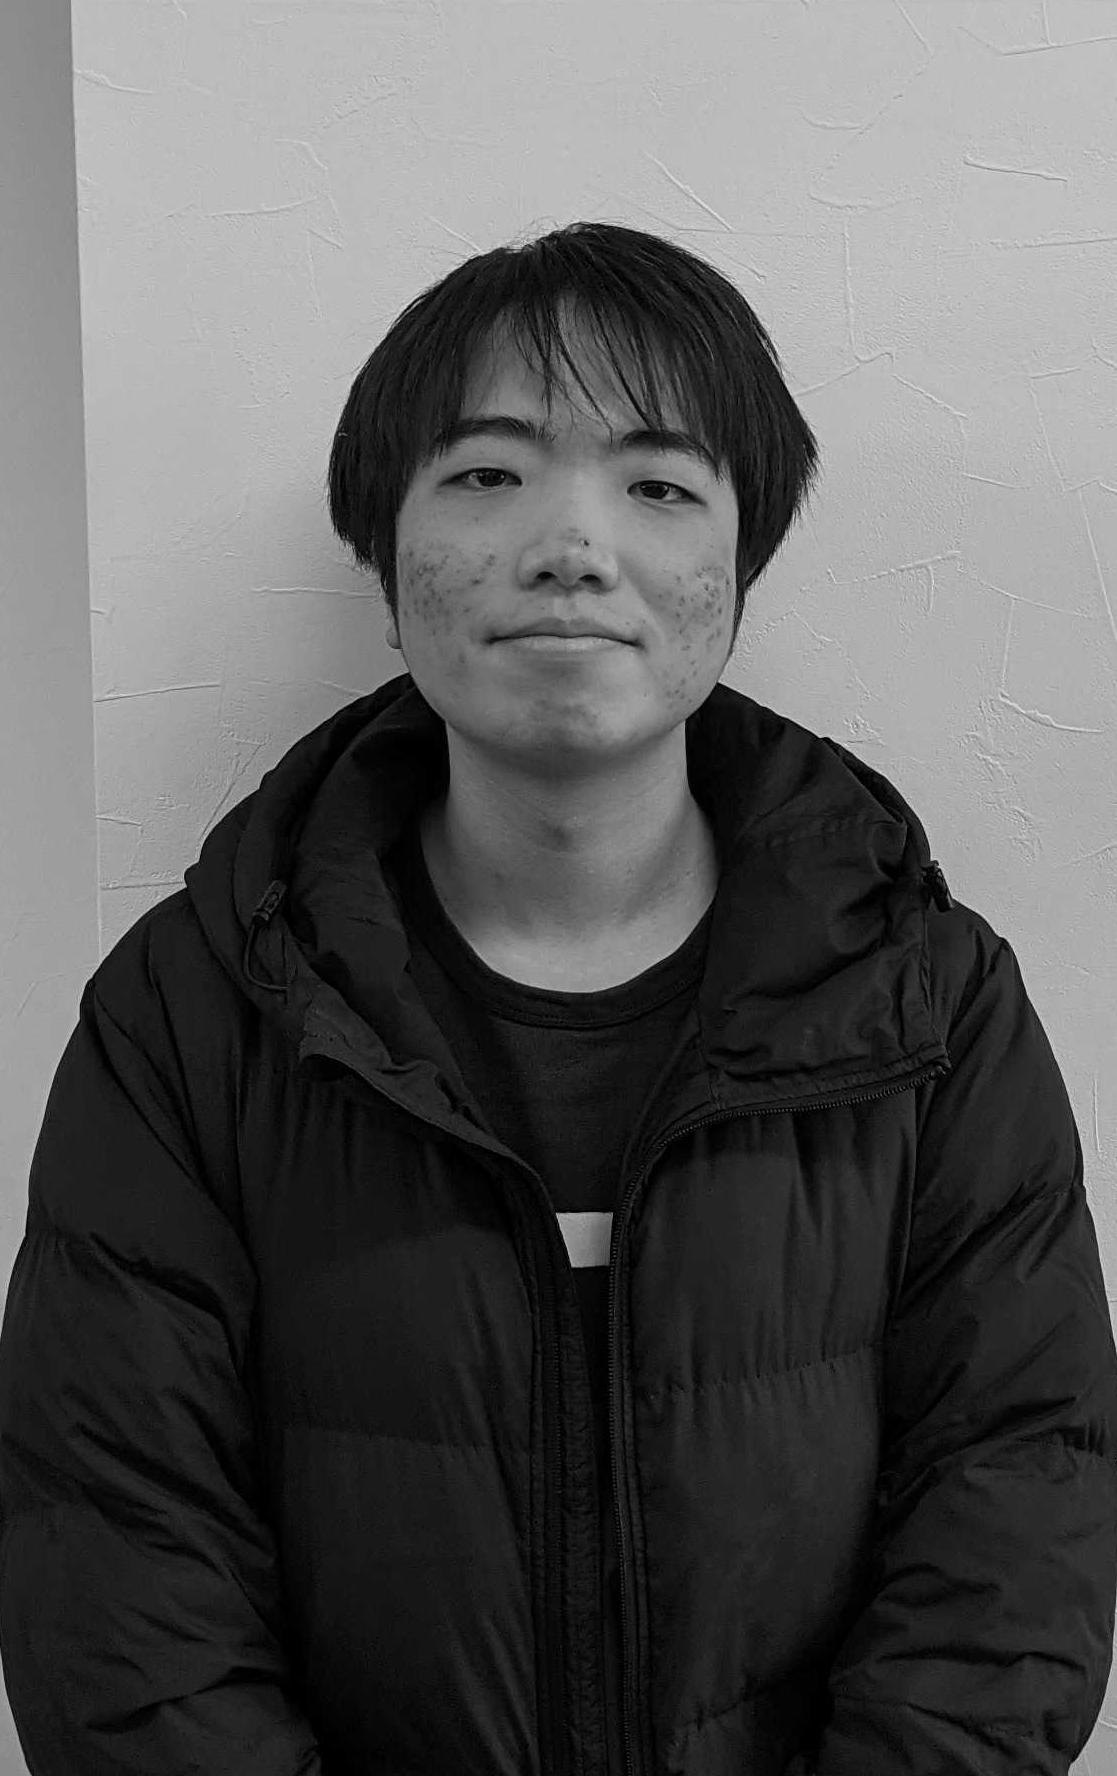 Haruki Izumiya